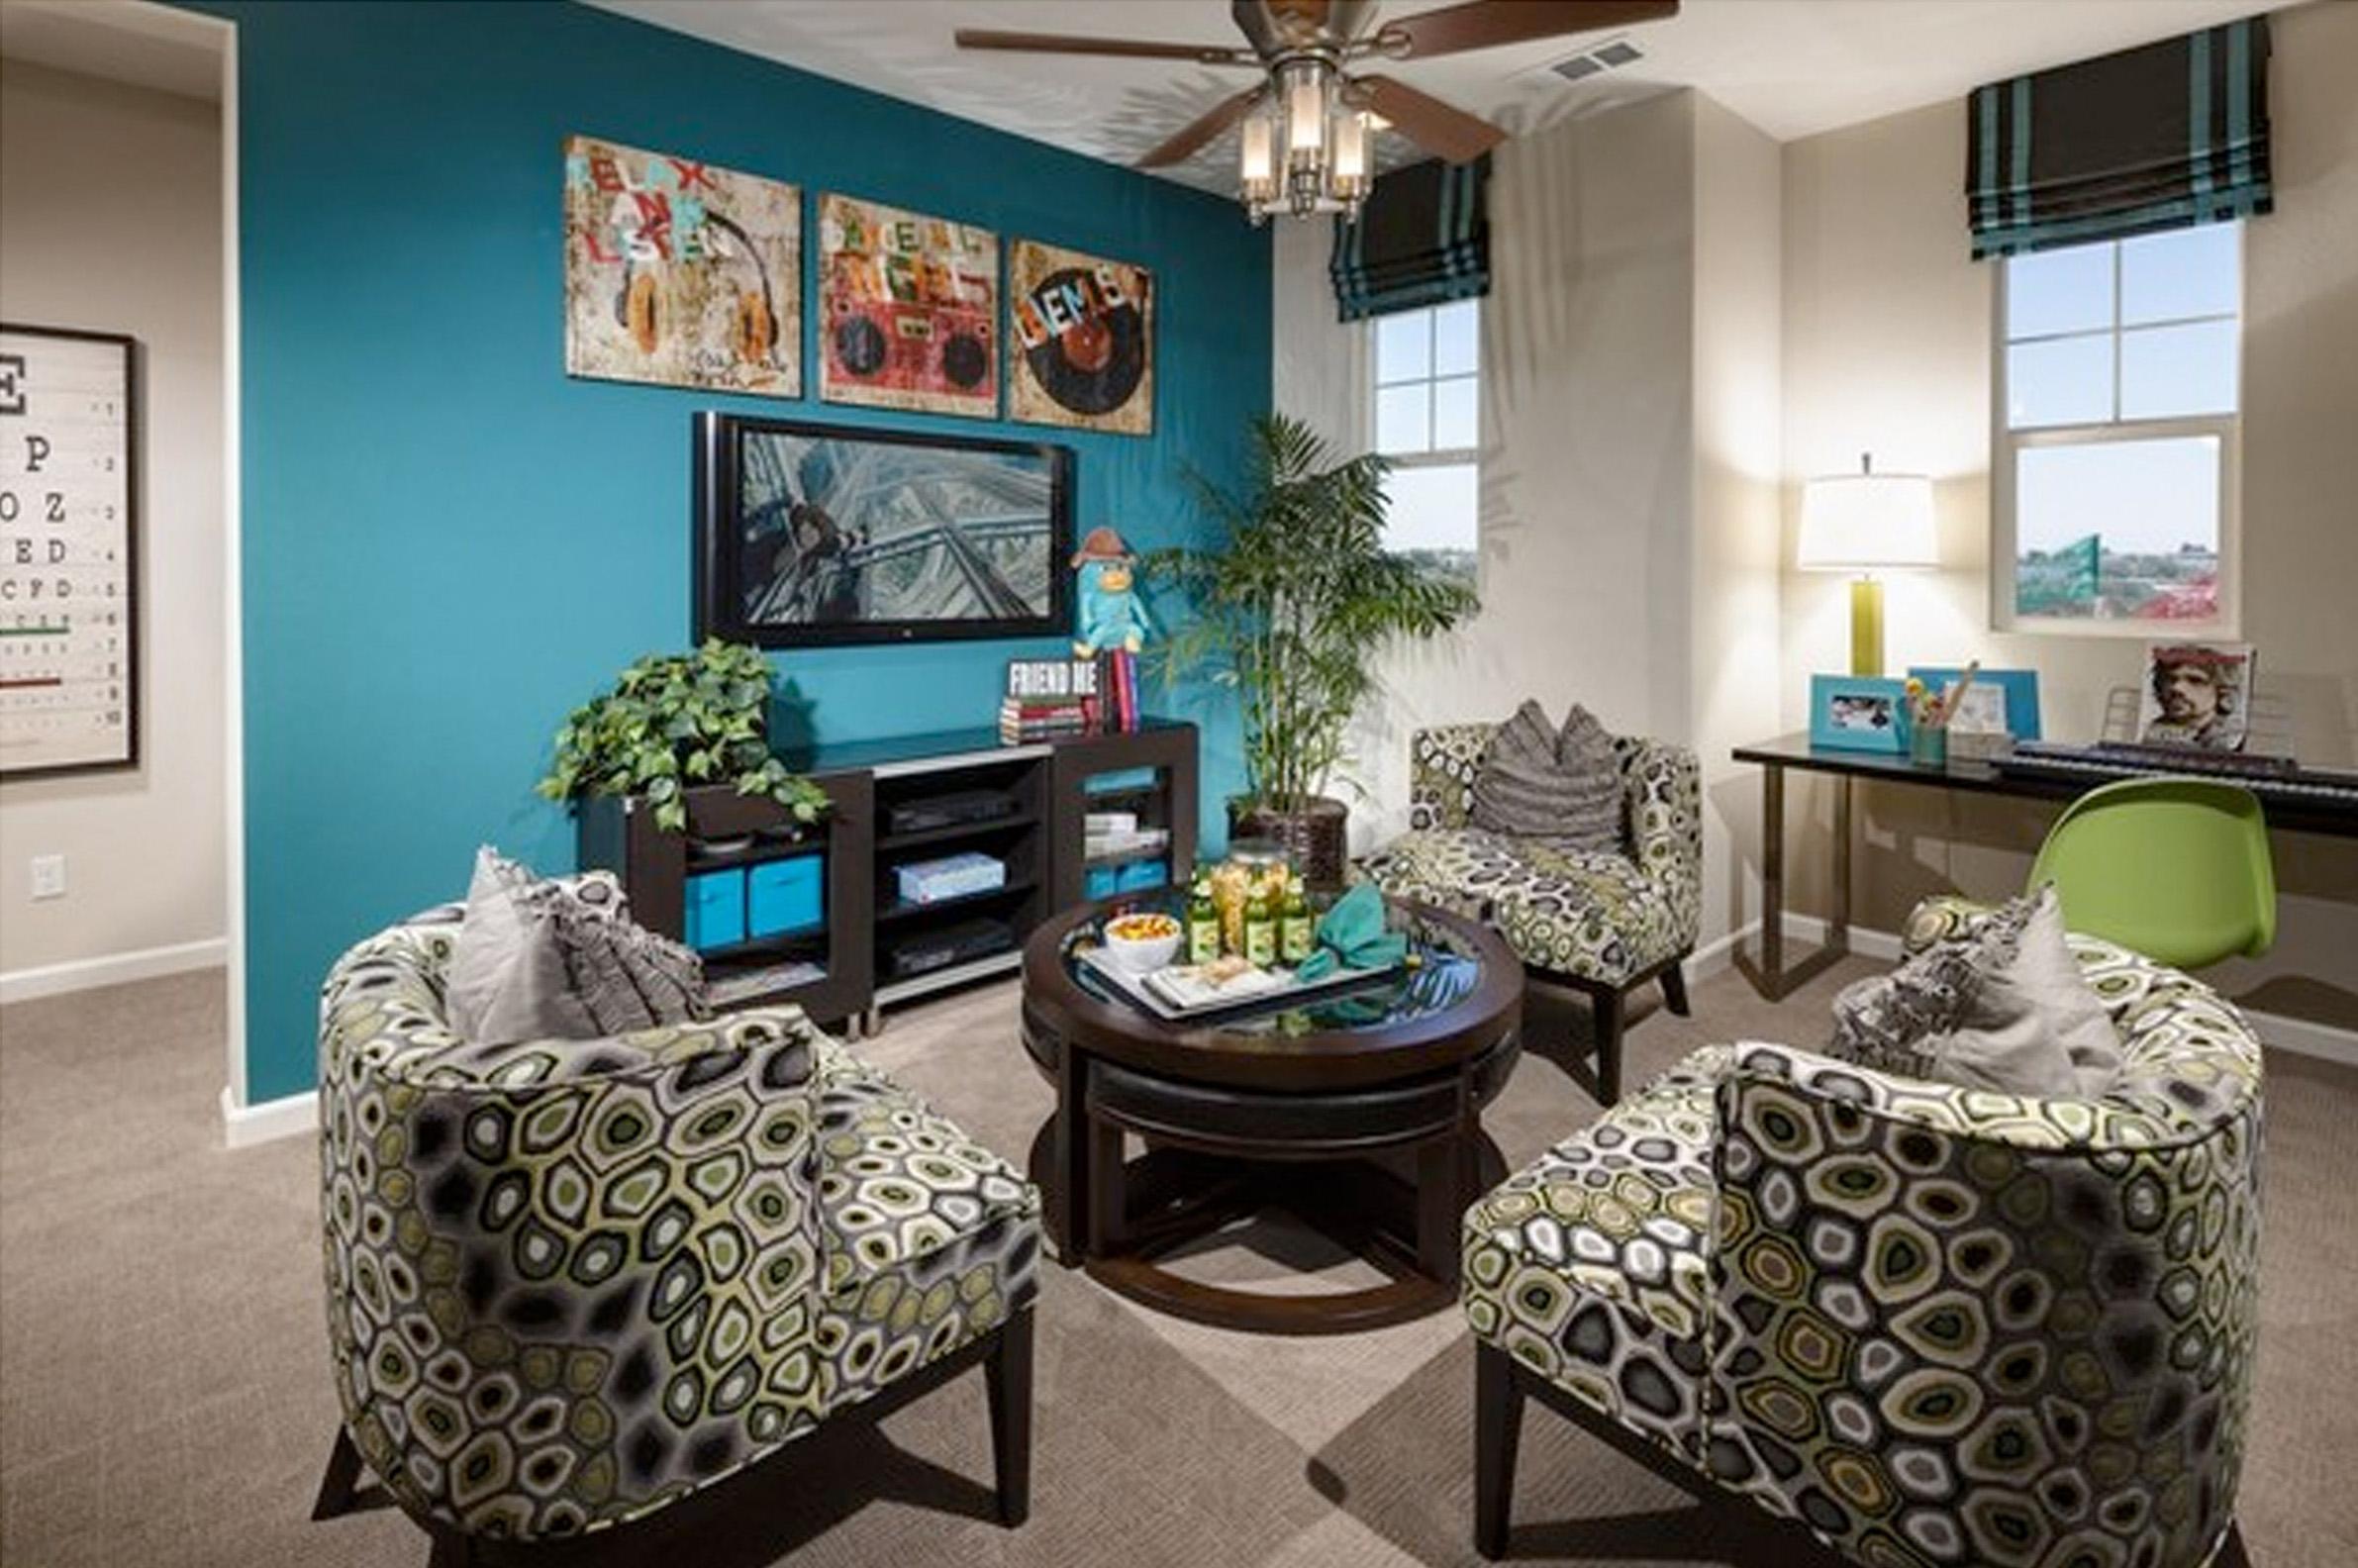 Sorrento Heights Show Home - San Diego, CA